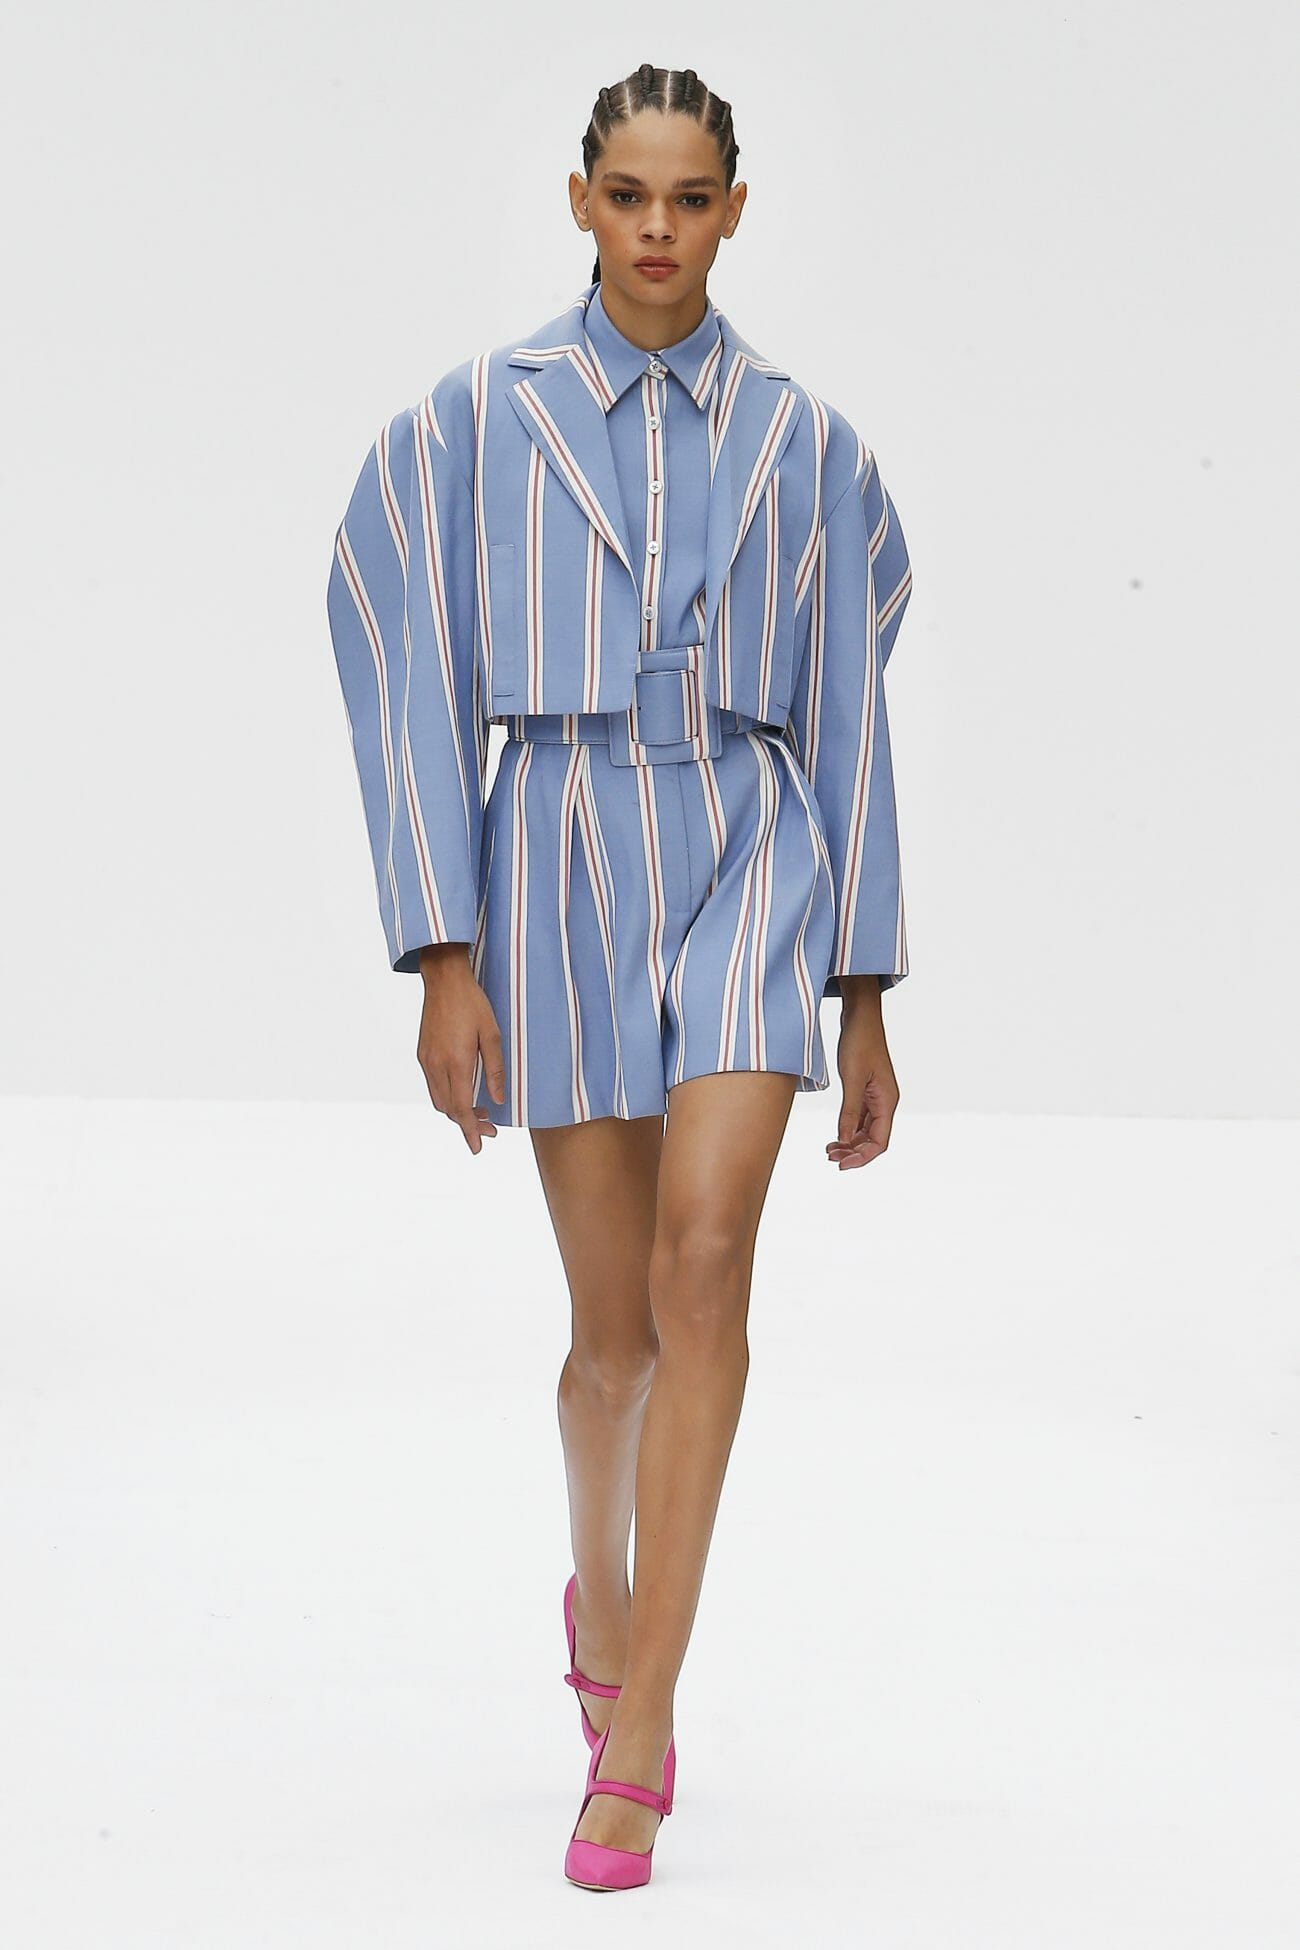 Carolina Herrera New York blue stripes dress